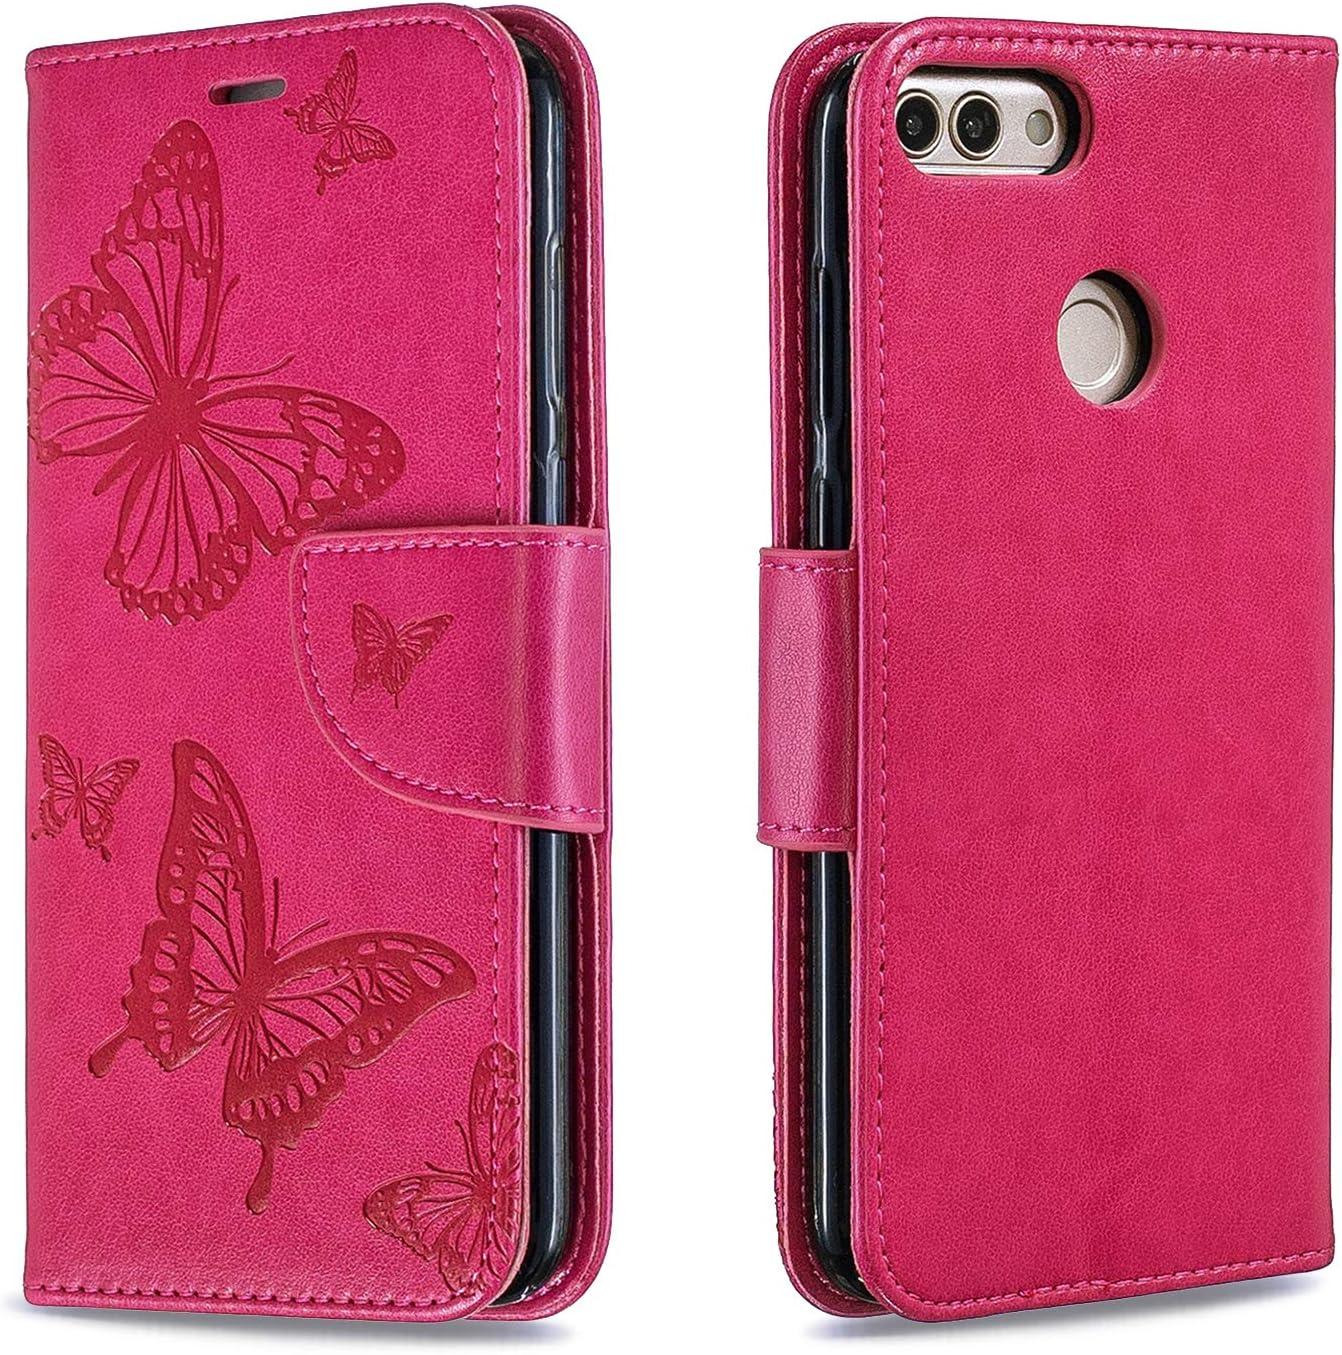 Lomogo Leather Wallet Case with Kickstand Card Holder Shockproof Flip Case Cover for Huawei P Smart LOBFE140187 Gold Huawei P Smart Case